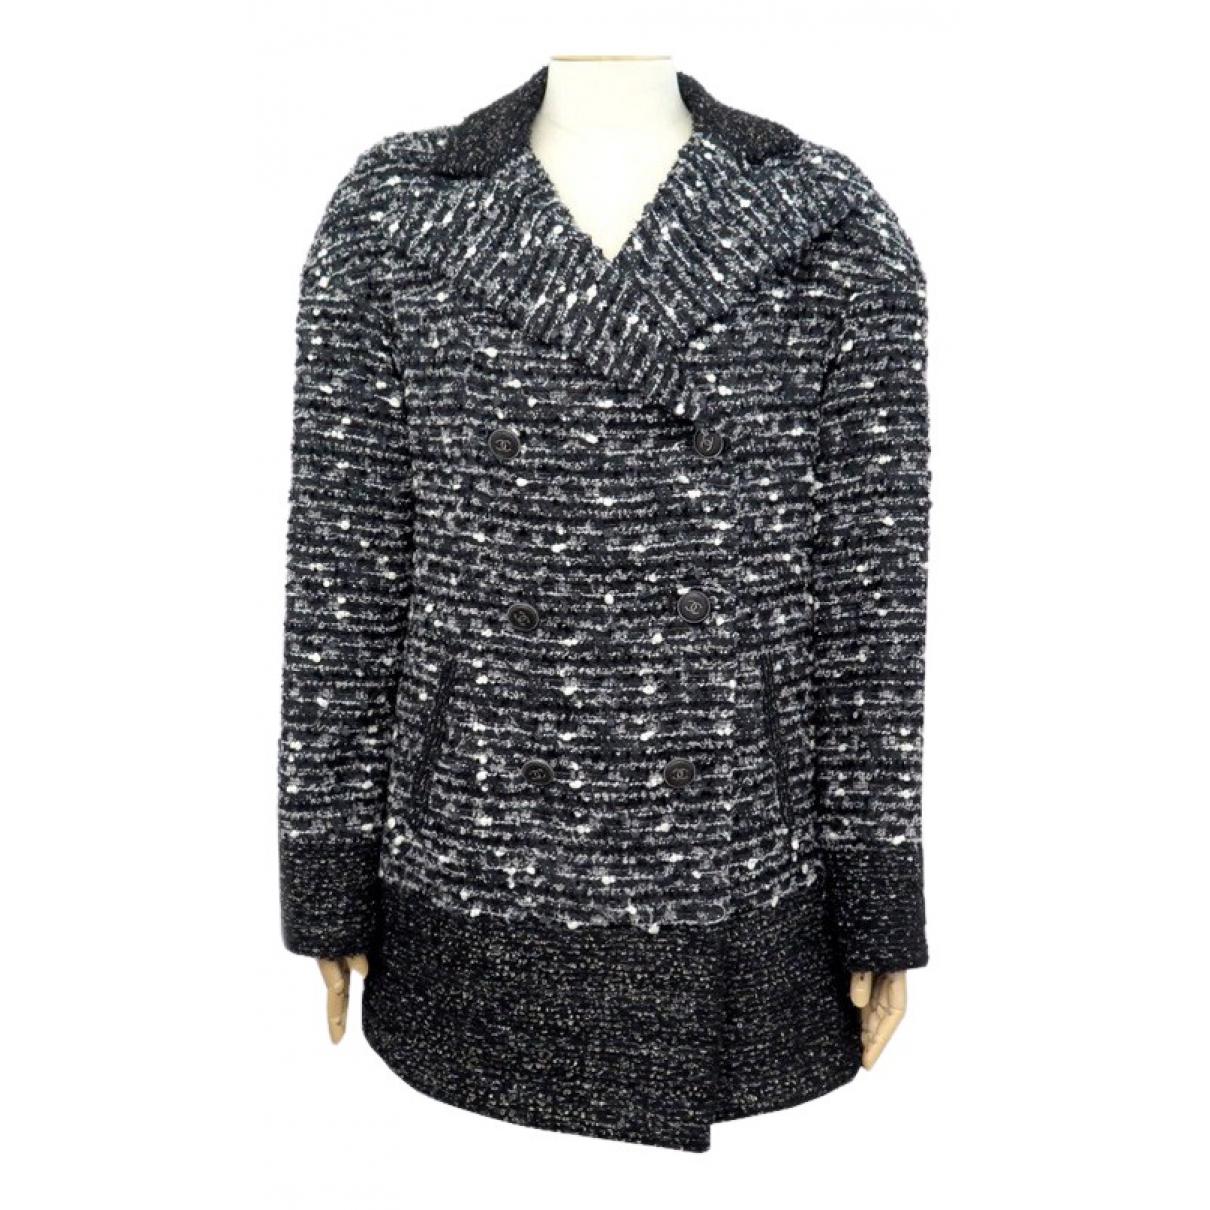 Chanel \N Black Tweed coat for Women M International